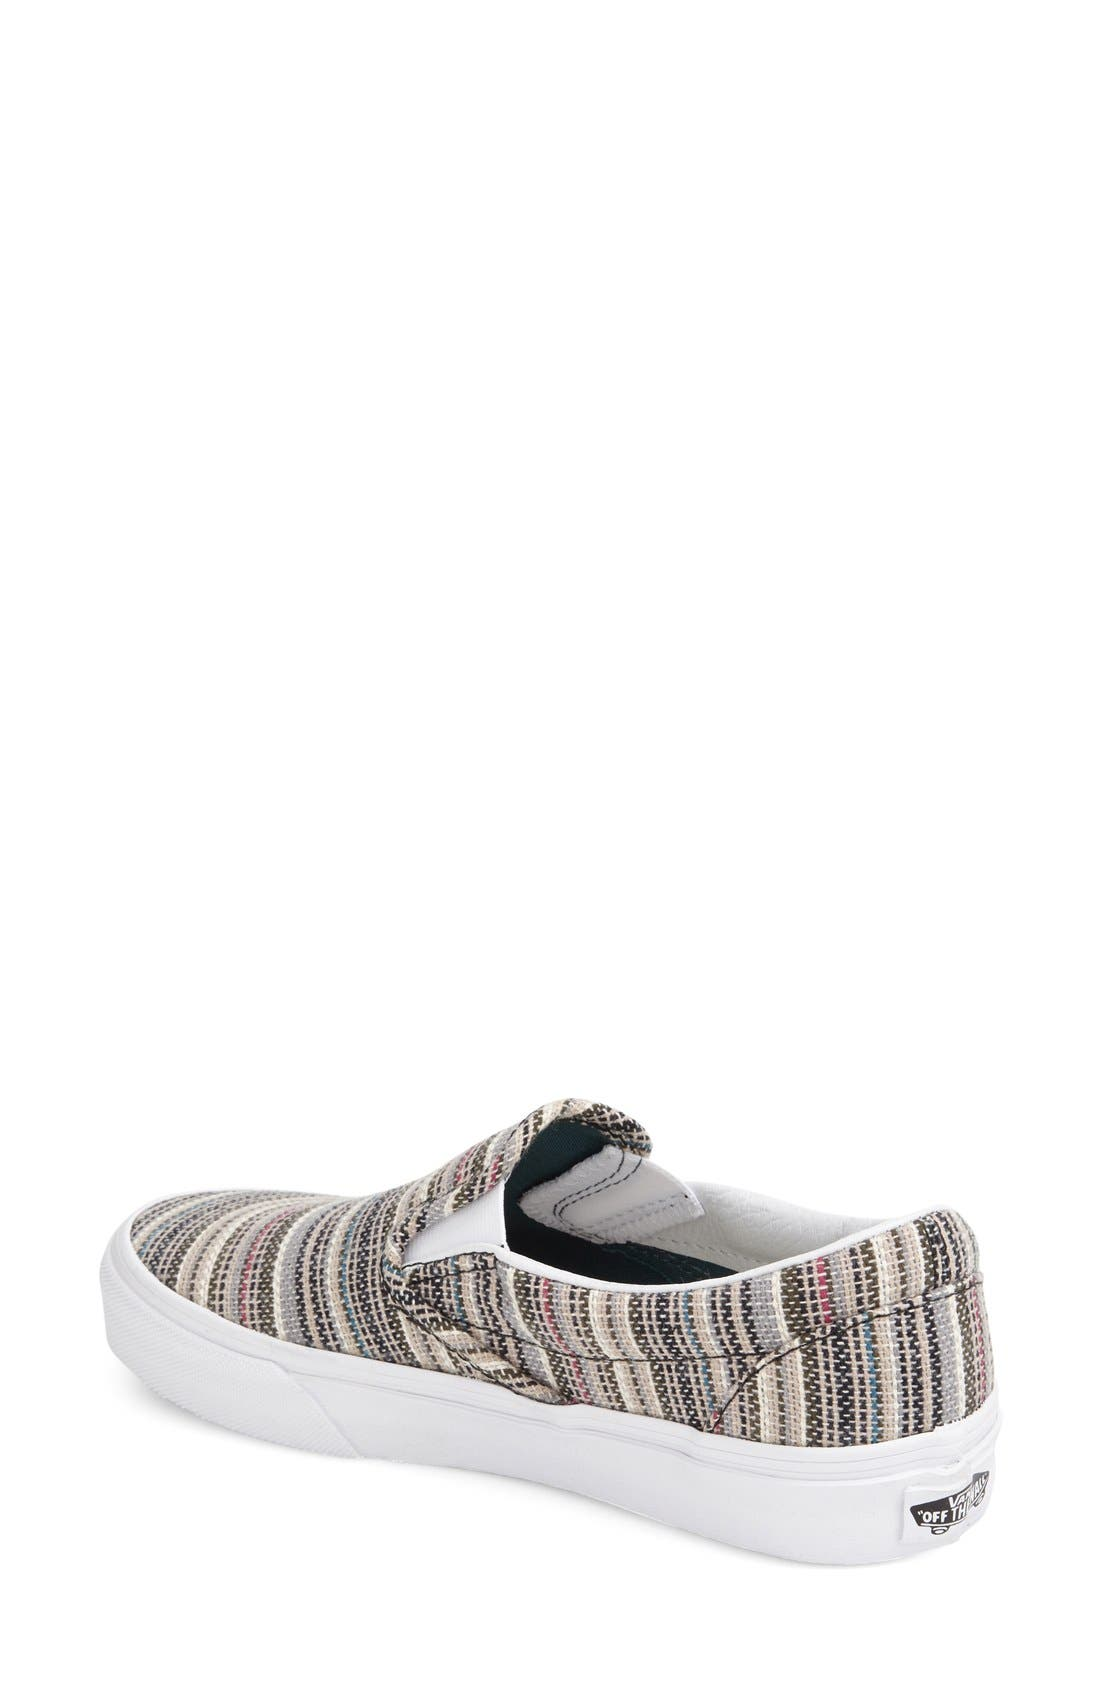 ,                             Classic Slip-On Sneaker,                             Main thumbnail 273, color,                             025